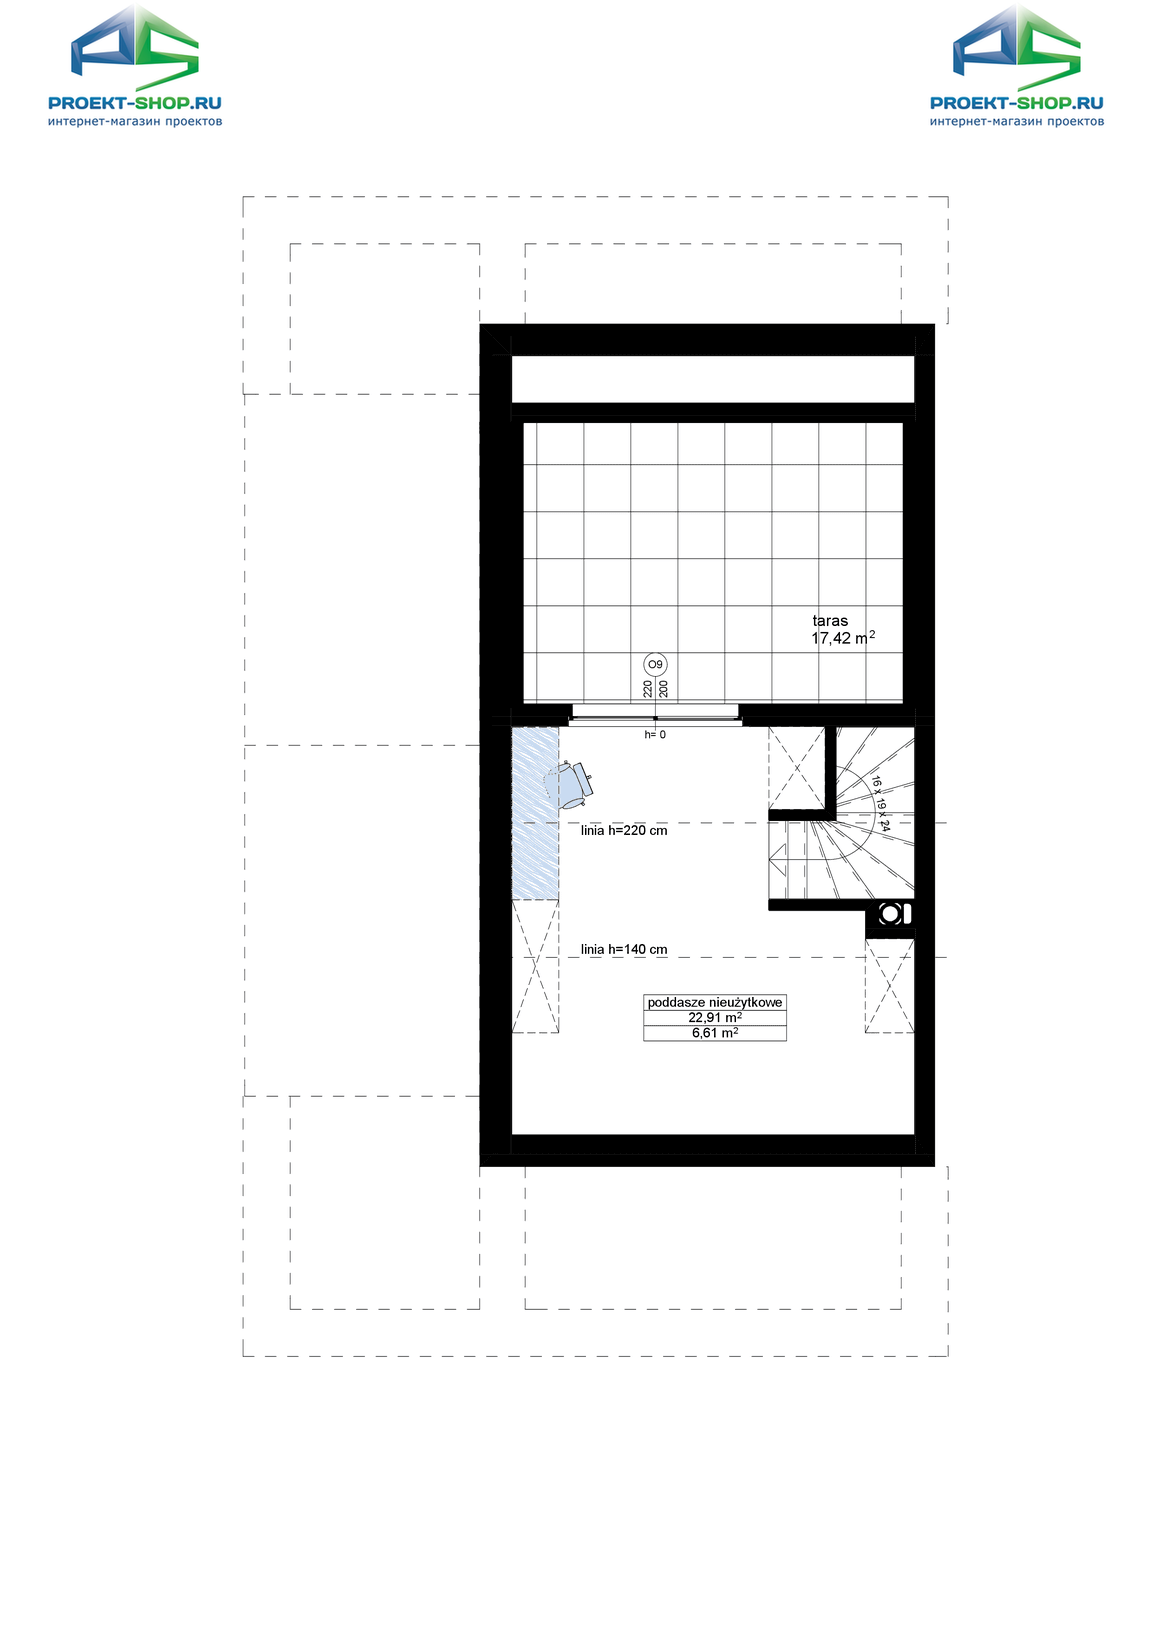 Планировка проекта zb36